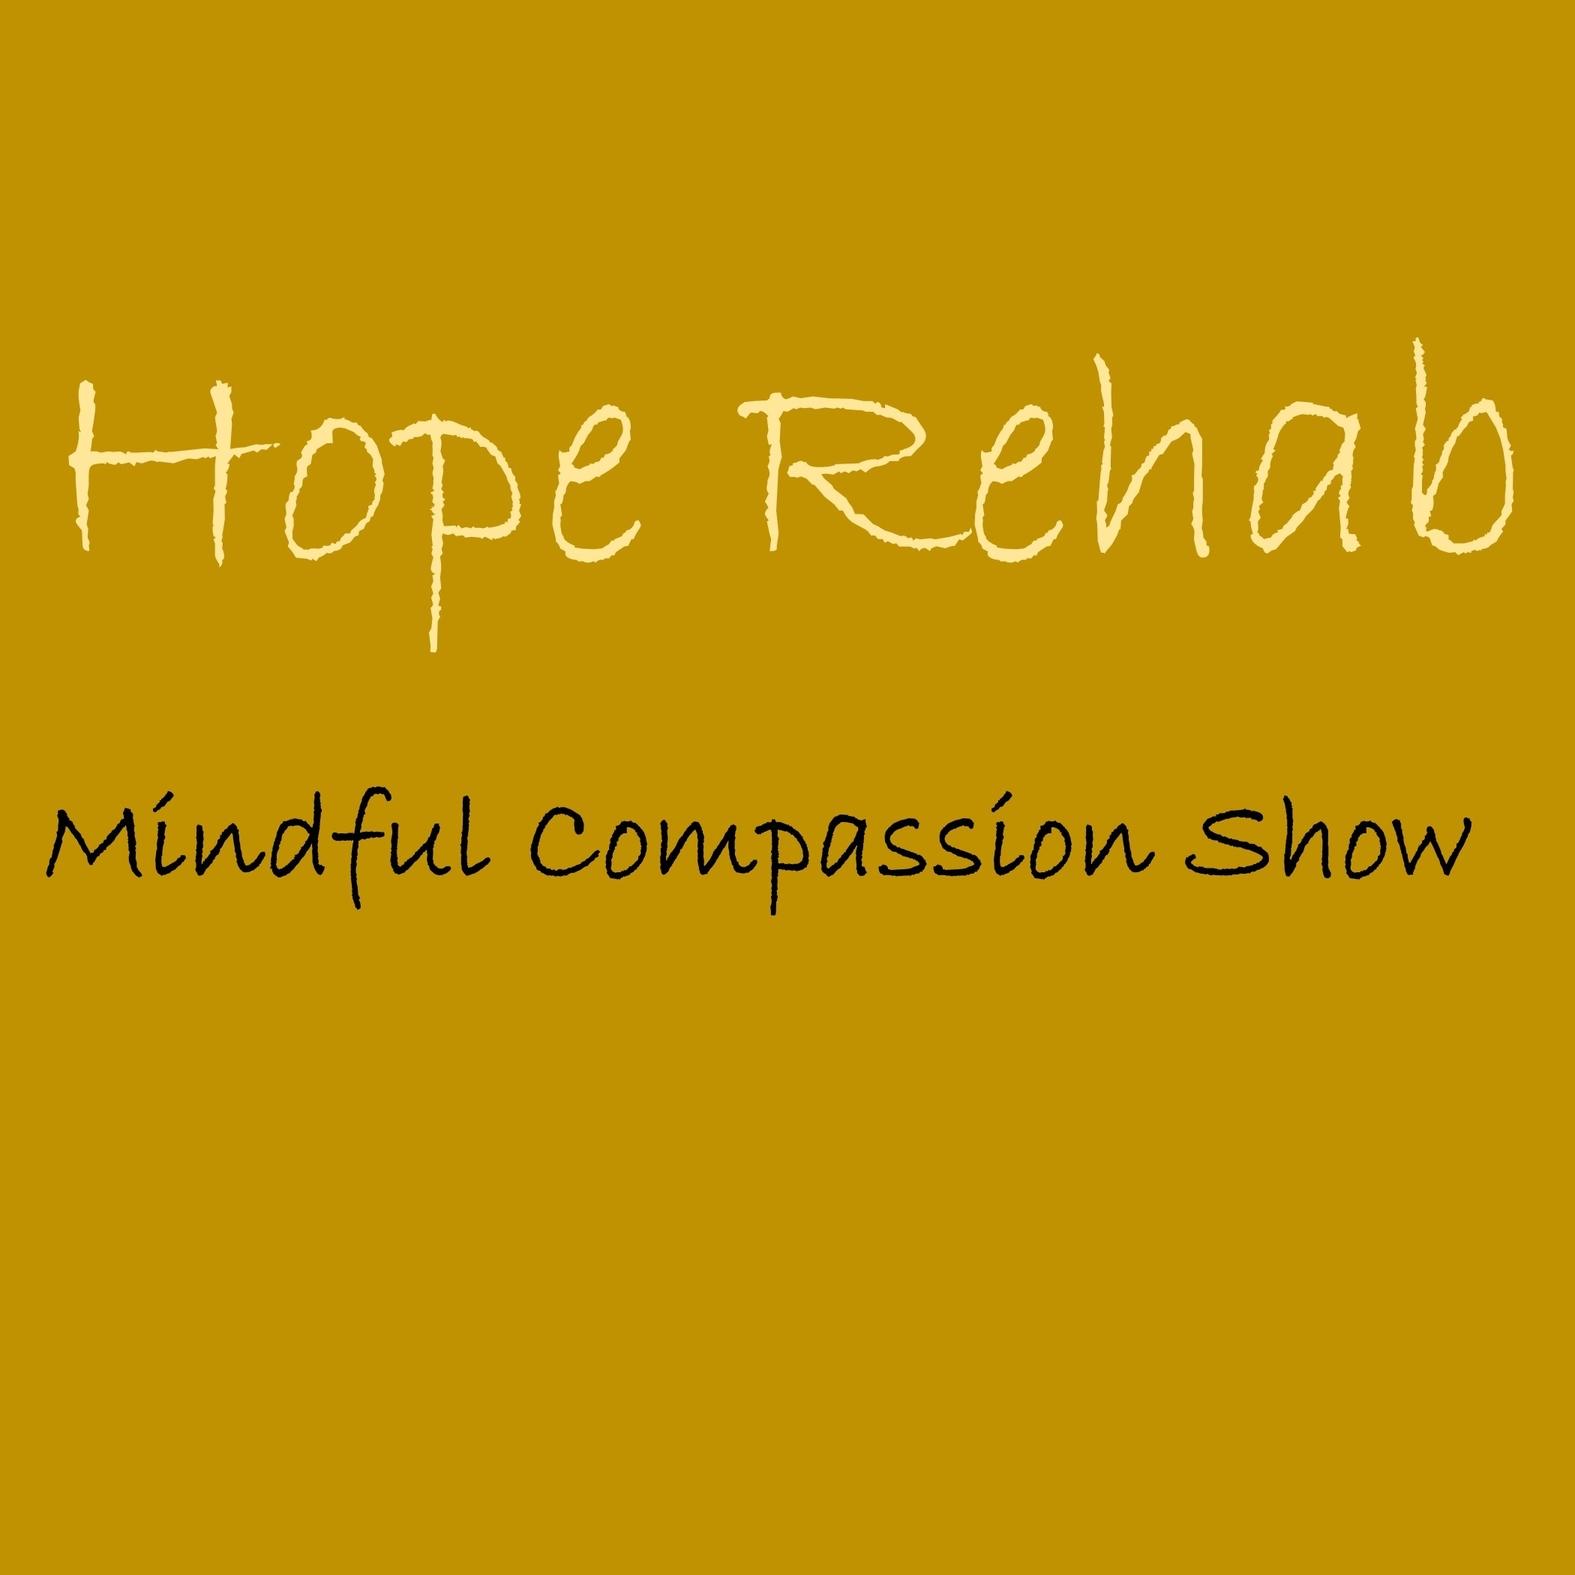 Hope Rehab Mindful Compassion Show